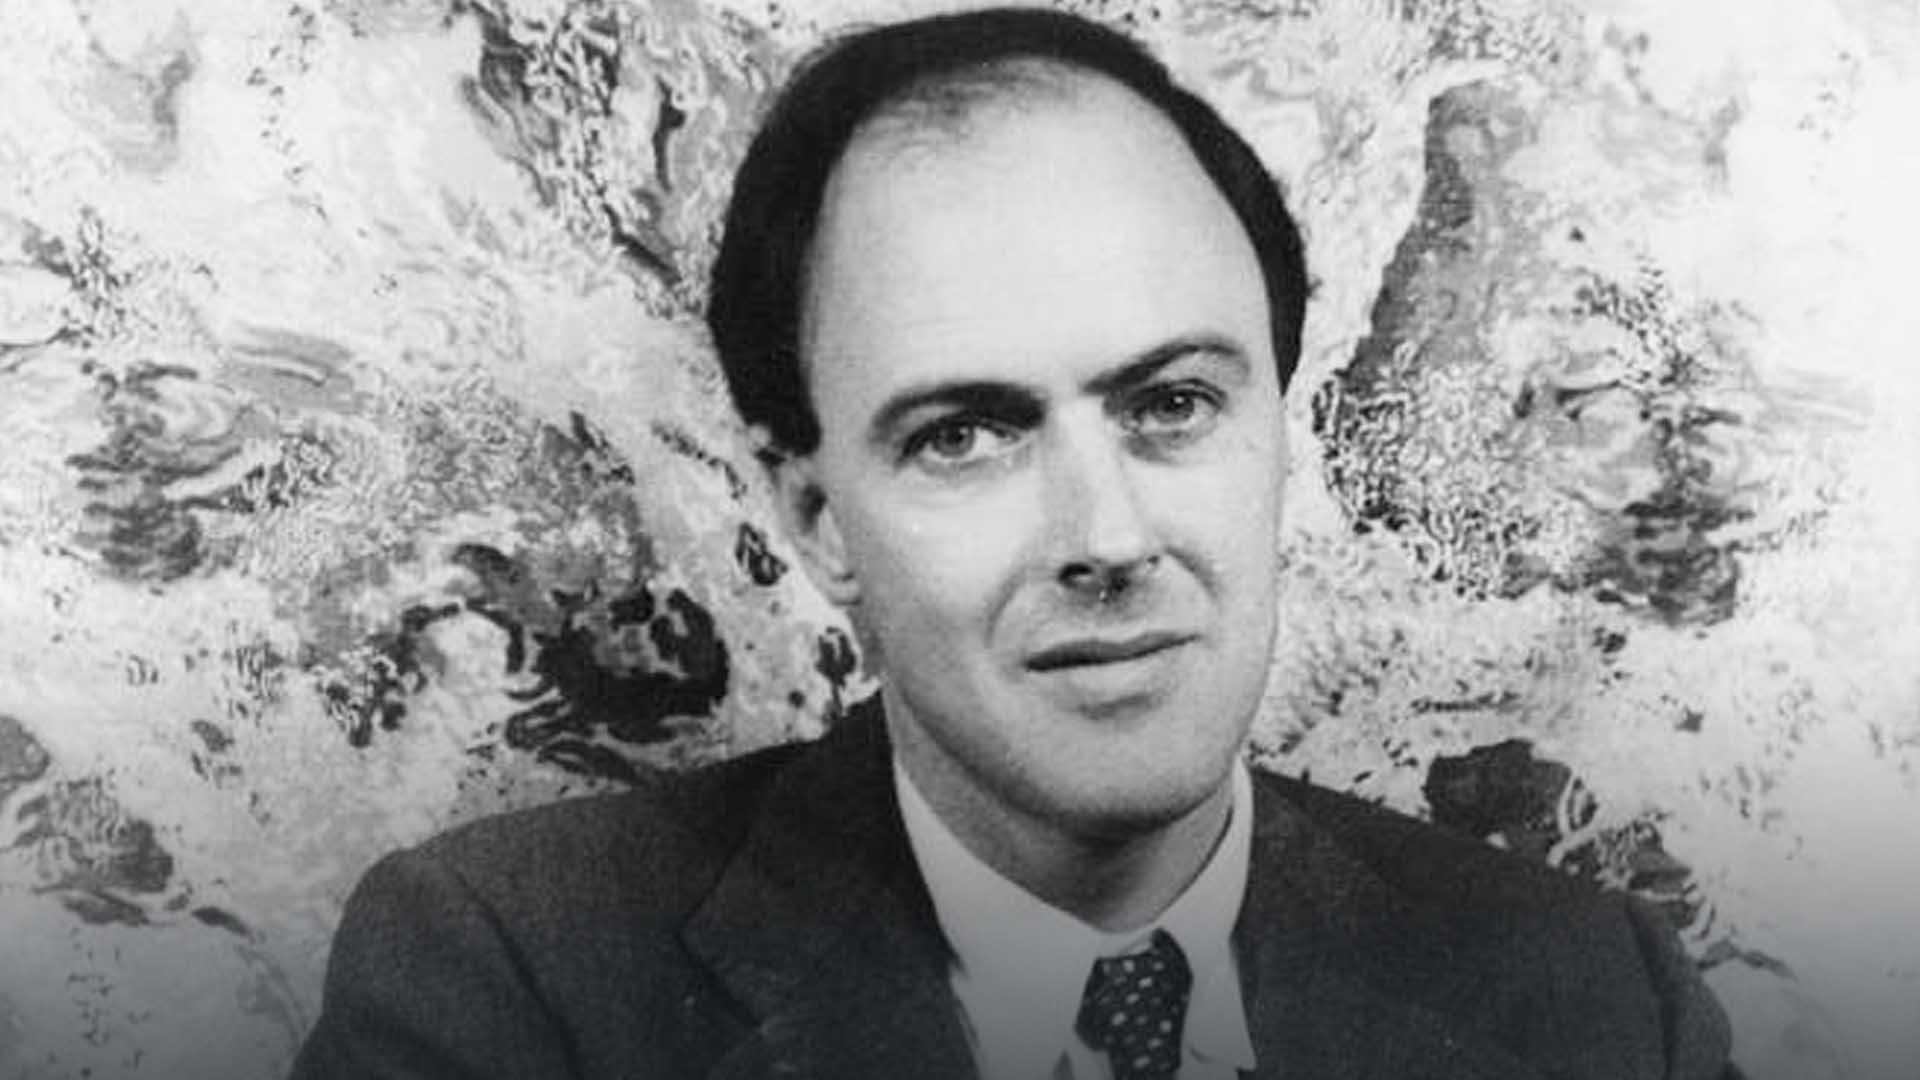 La lettera di Roald Dahl sui vaccini